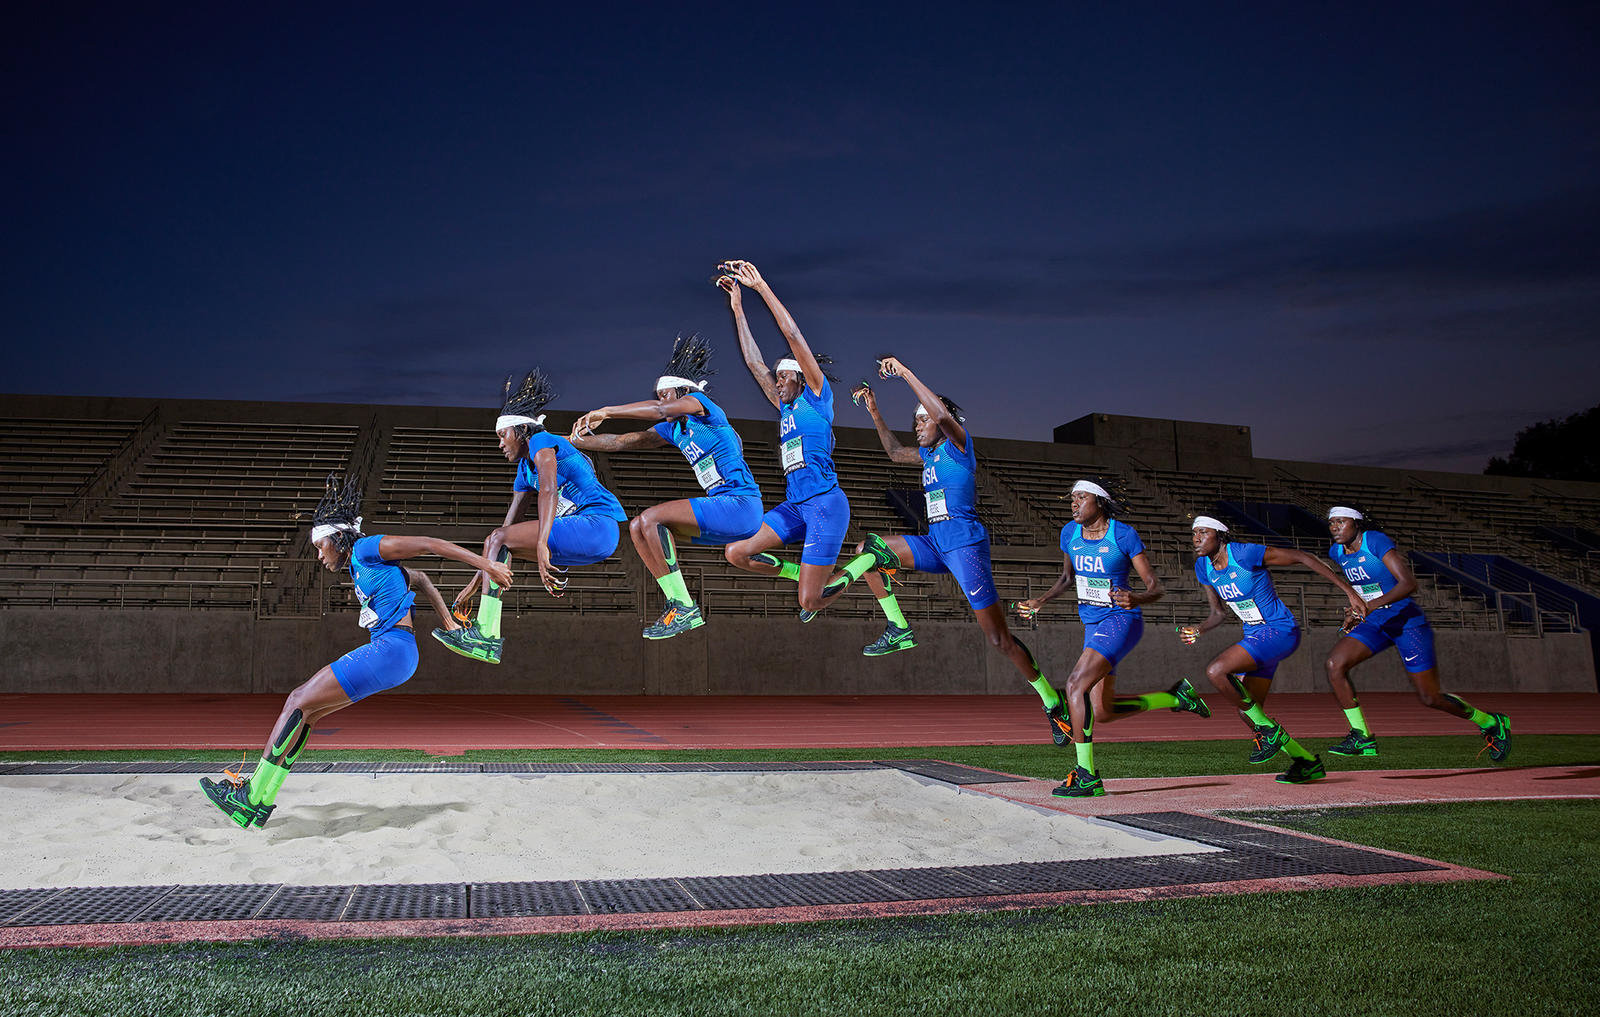 Nike x Off-White™️ Rubber Dunk 鞋款将在这个十一正式发售